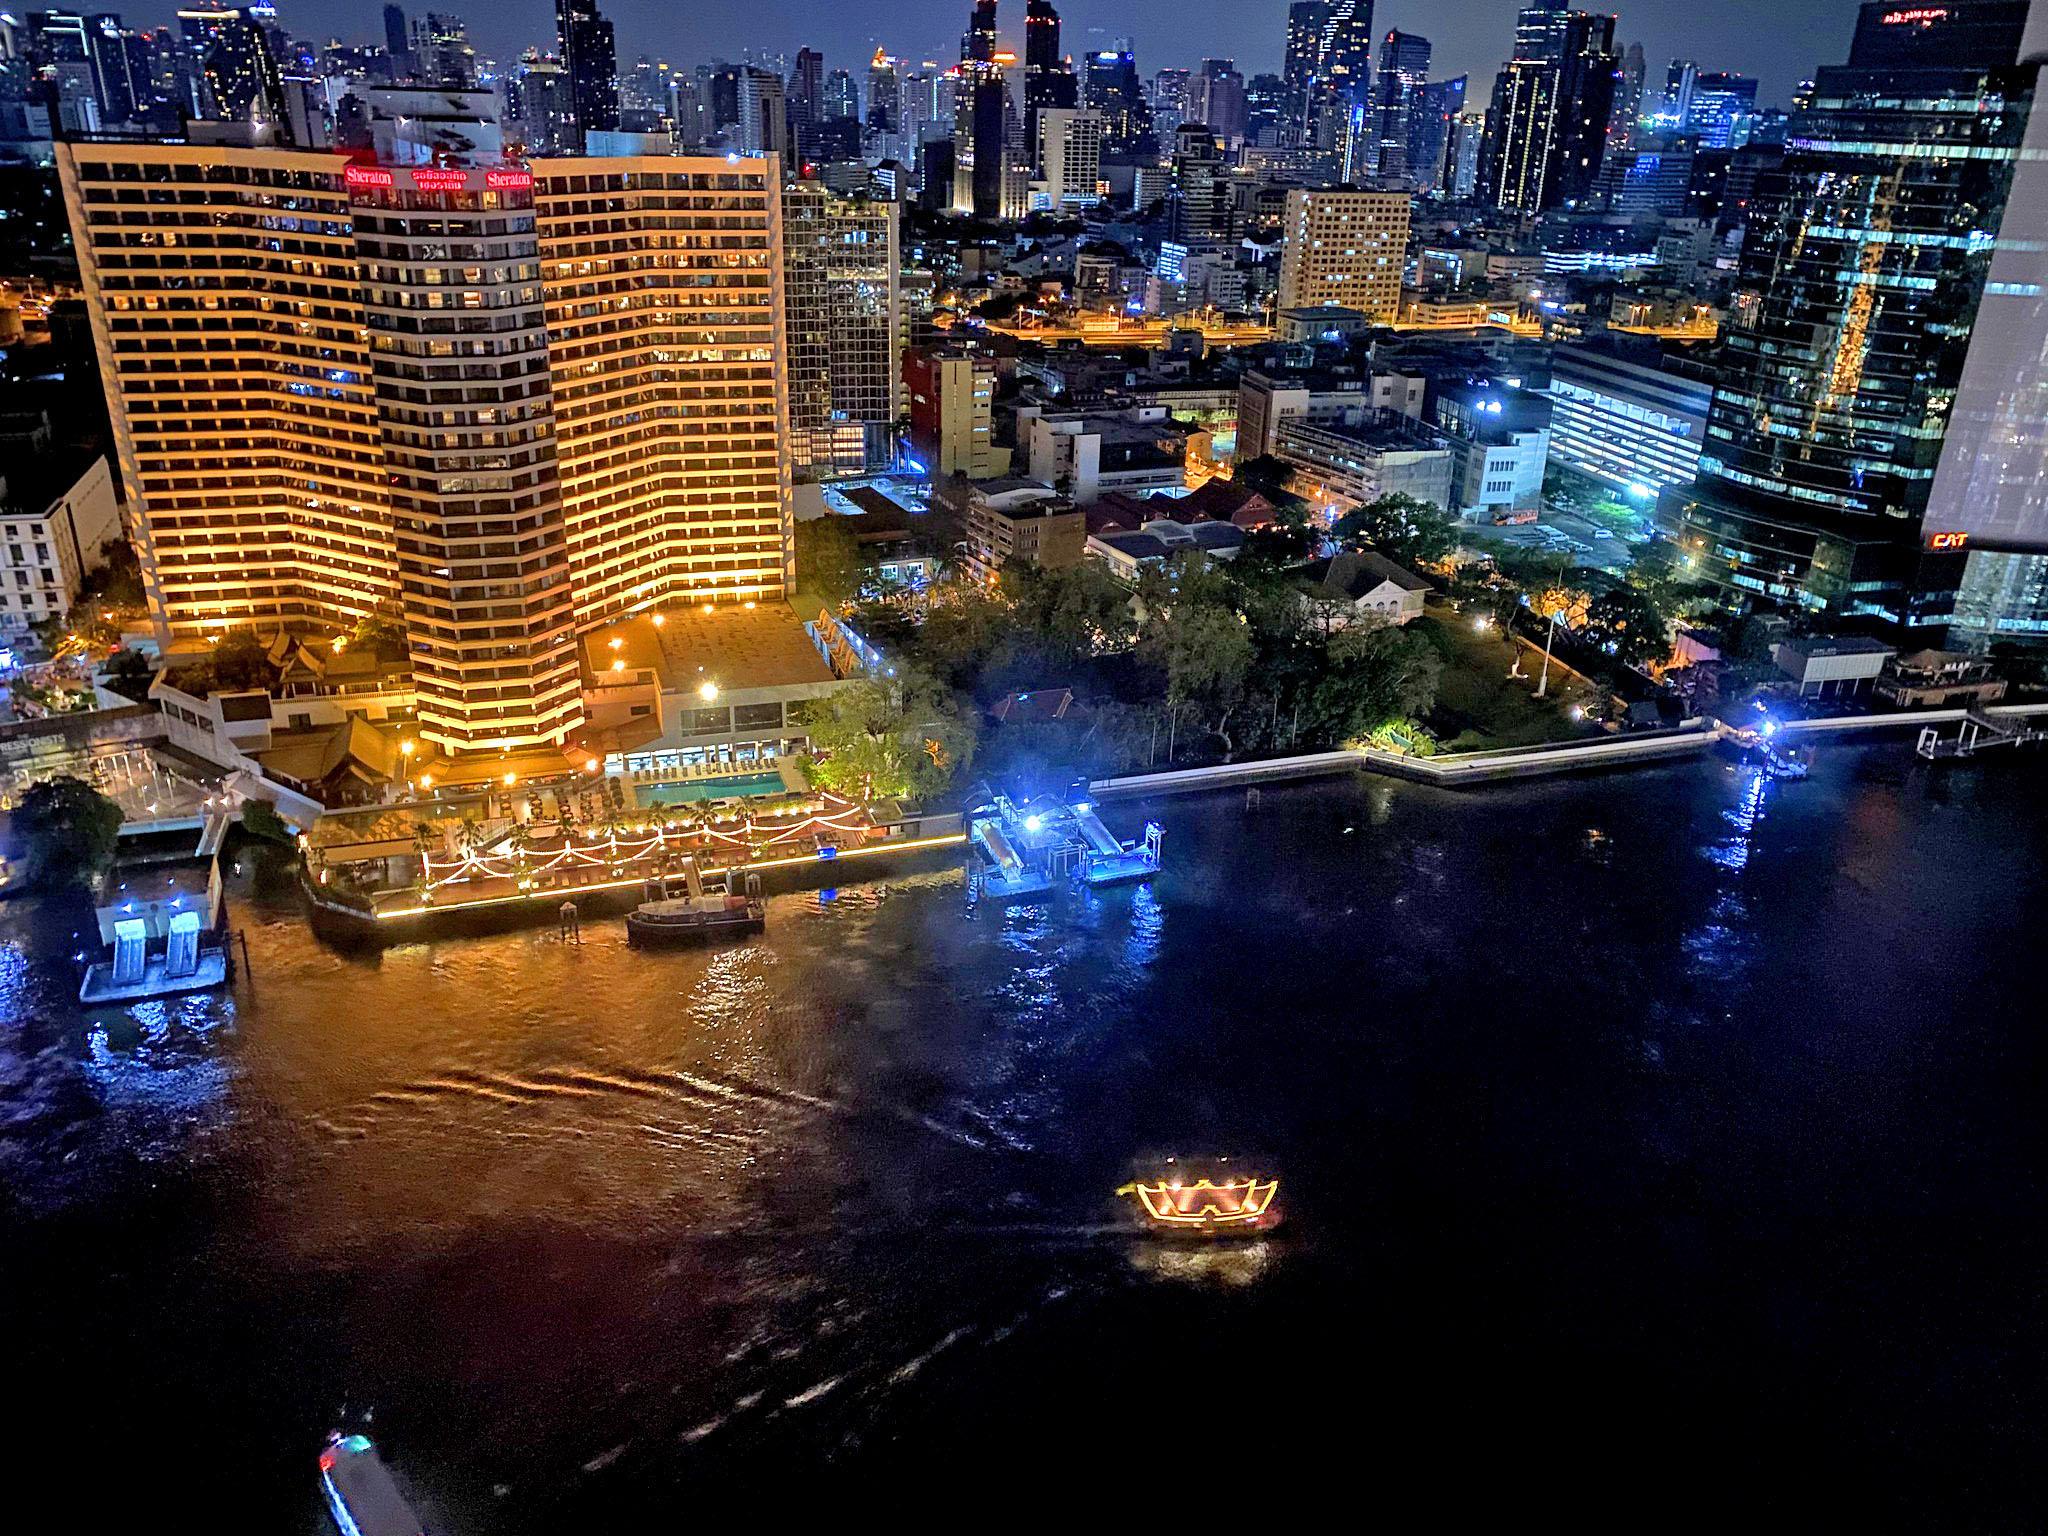 Lights Bangkok by Kalboz.jpg